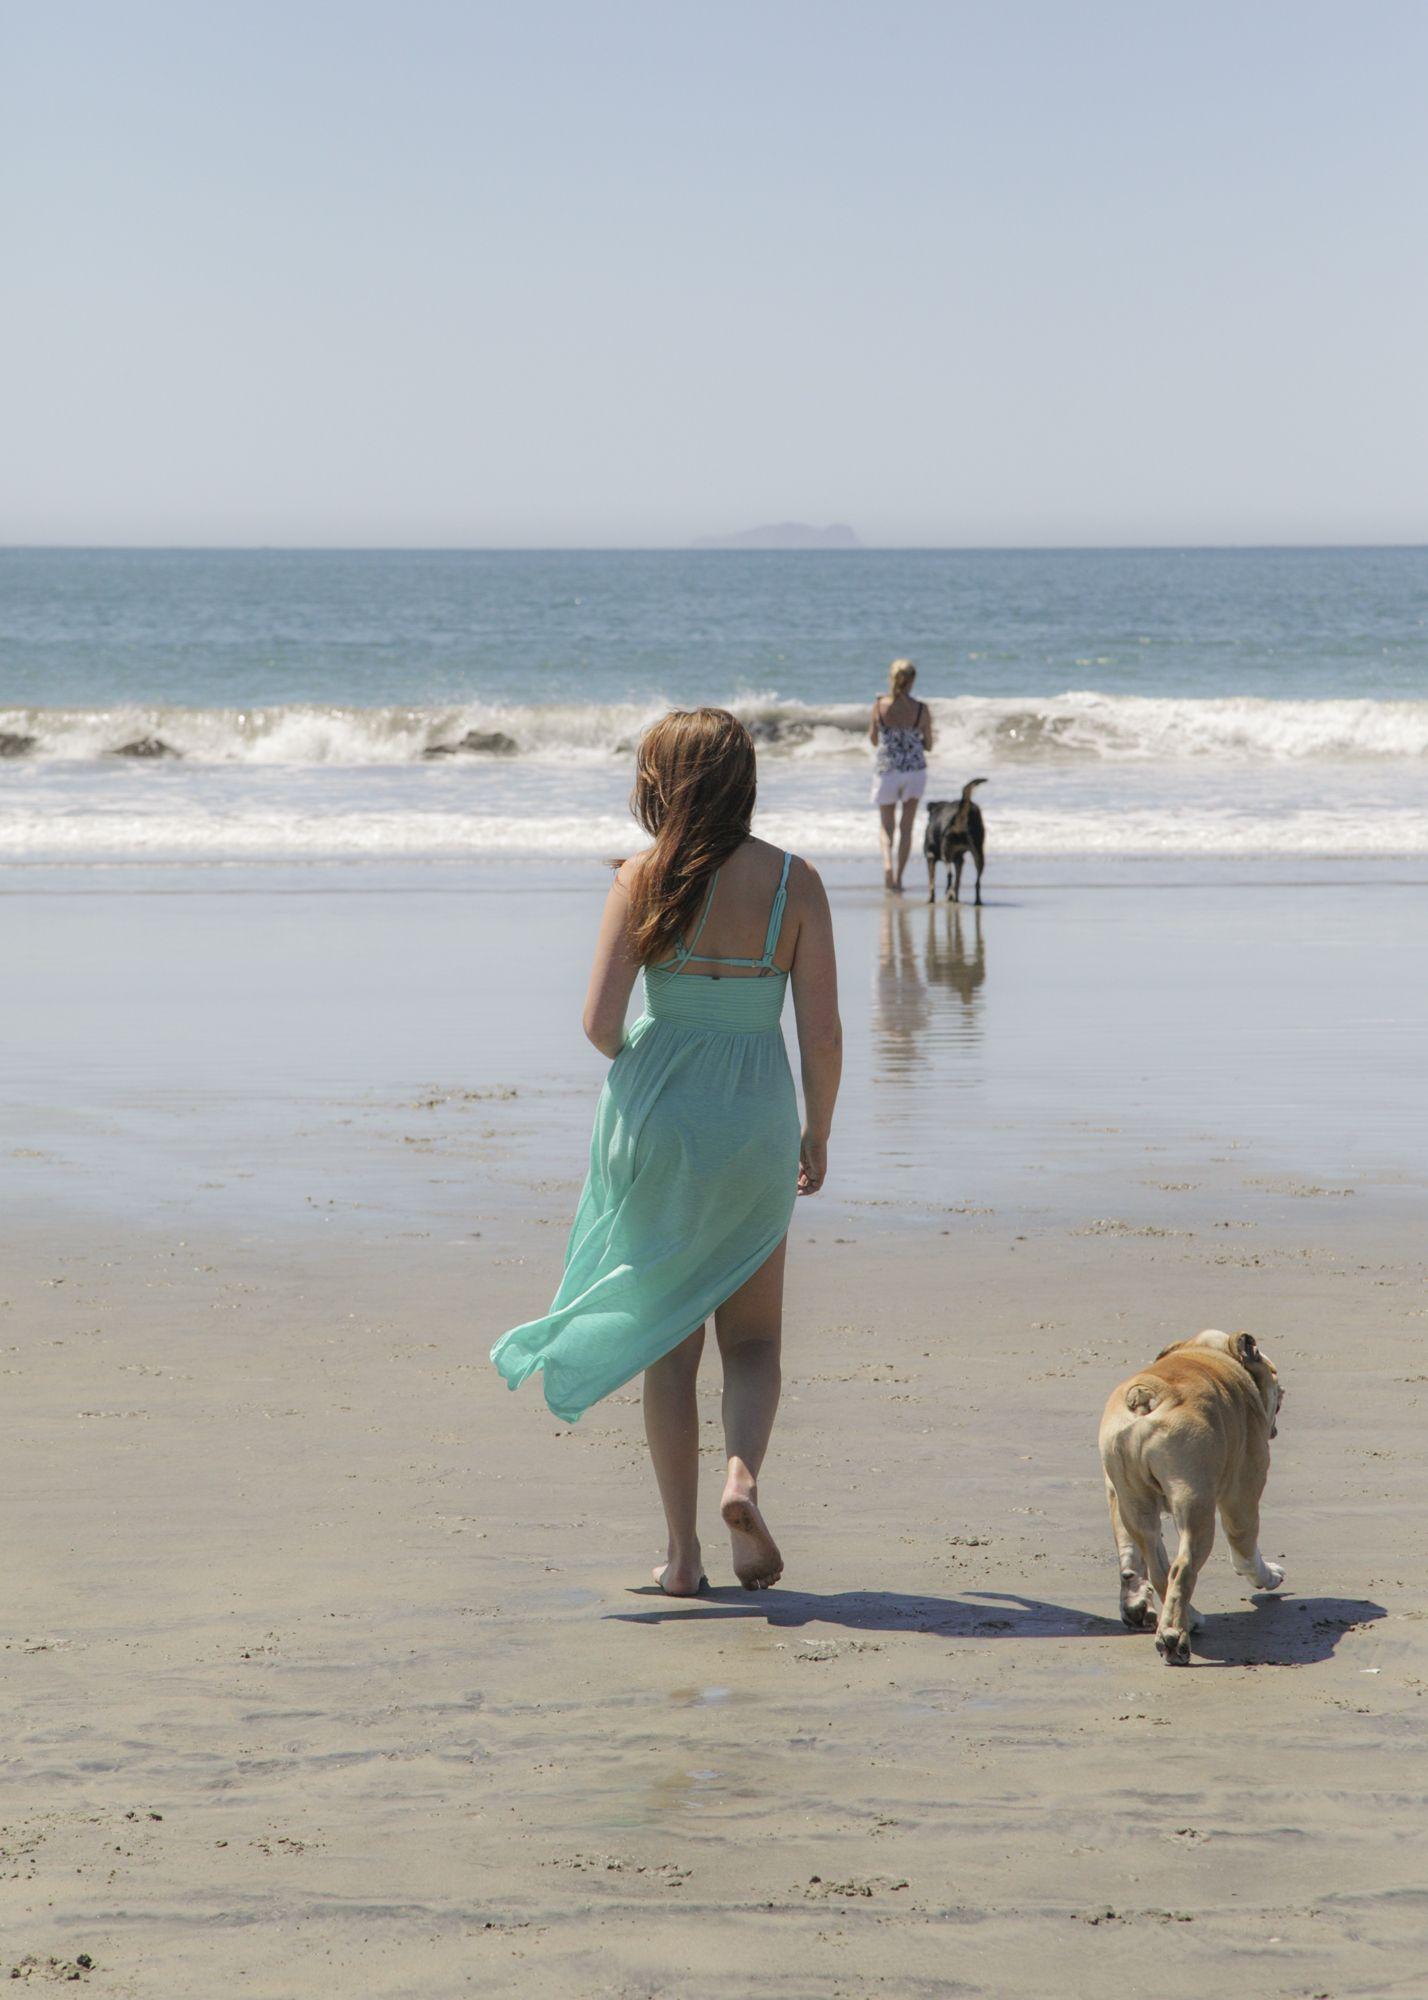 Rawco At Coronado Dog Beach In San Diego Rawco California Sandiego Dogbeach San Diego Beach Dog Beach San Diego